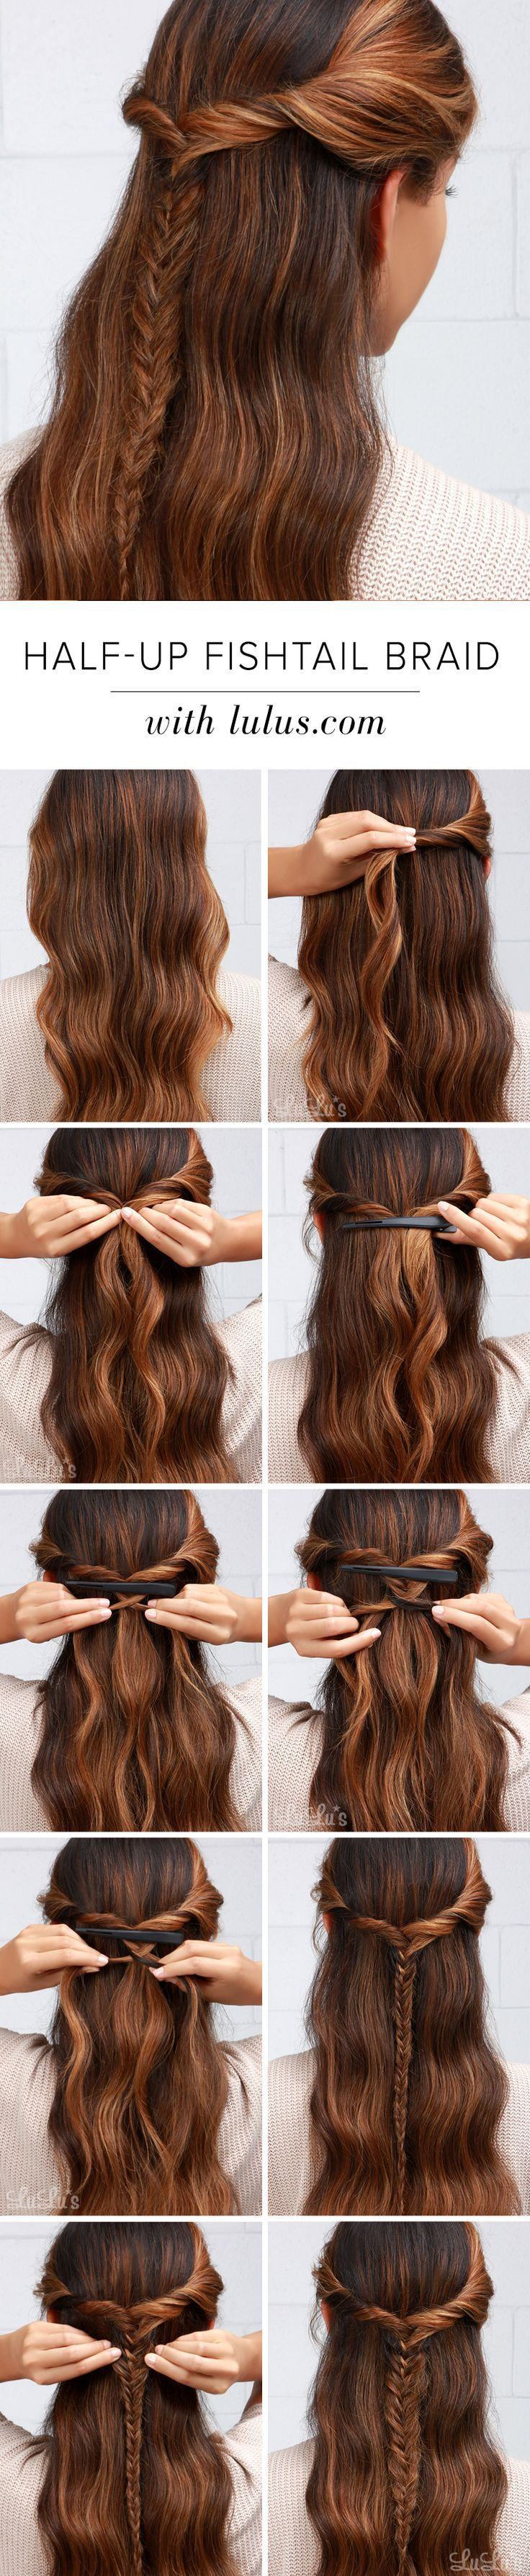 Lulus howto halfup fishtail braid fishtail braids fishtail and